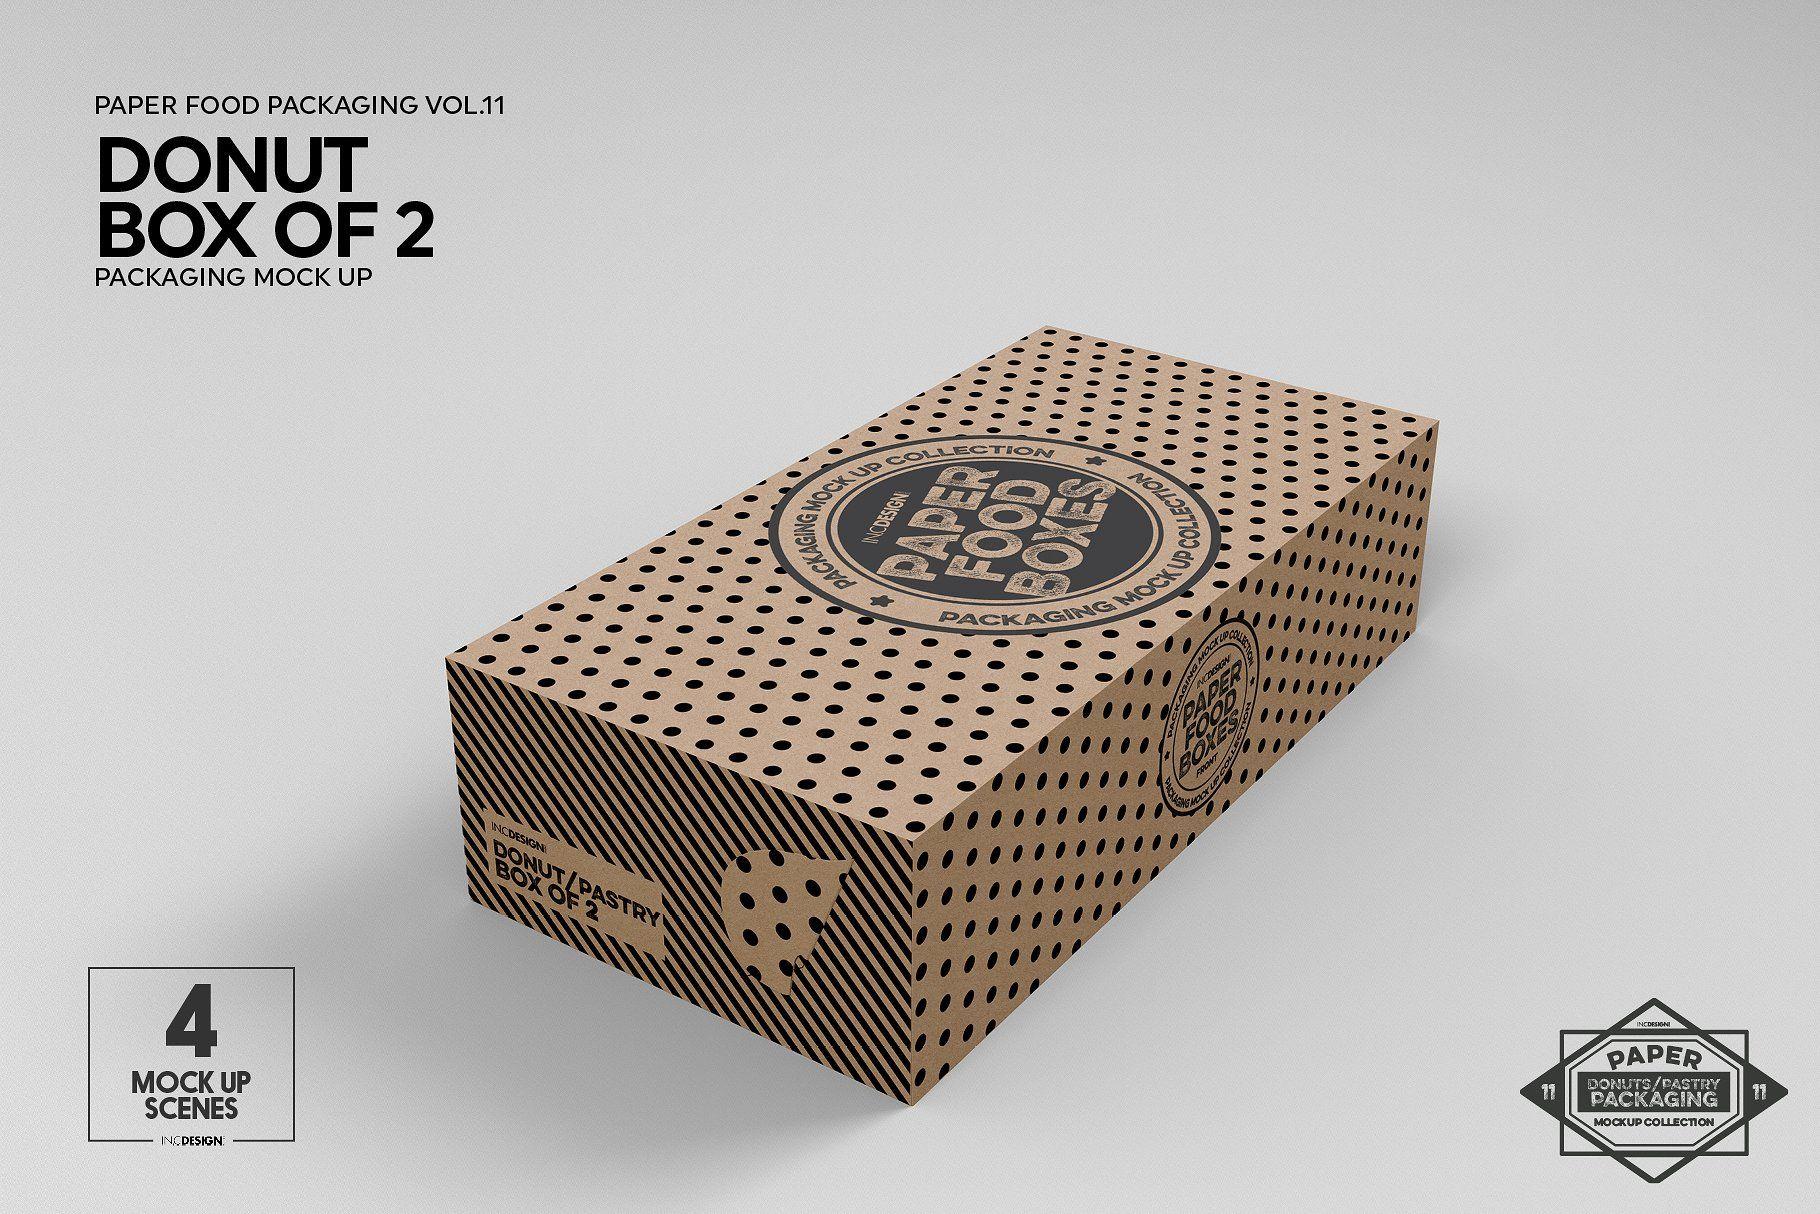 Download Vol 11 Food Box Packaging Mockups Food Box Packaging Packaging Mockup Box Packaging